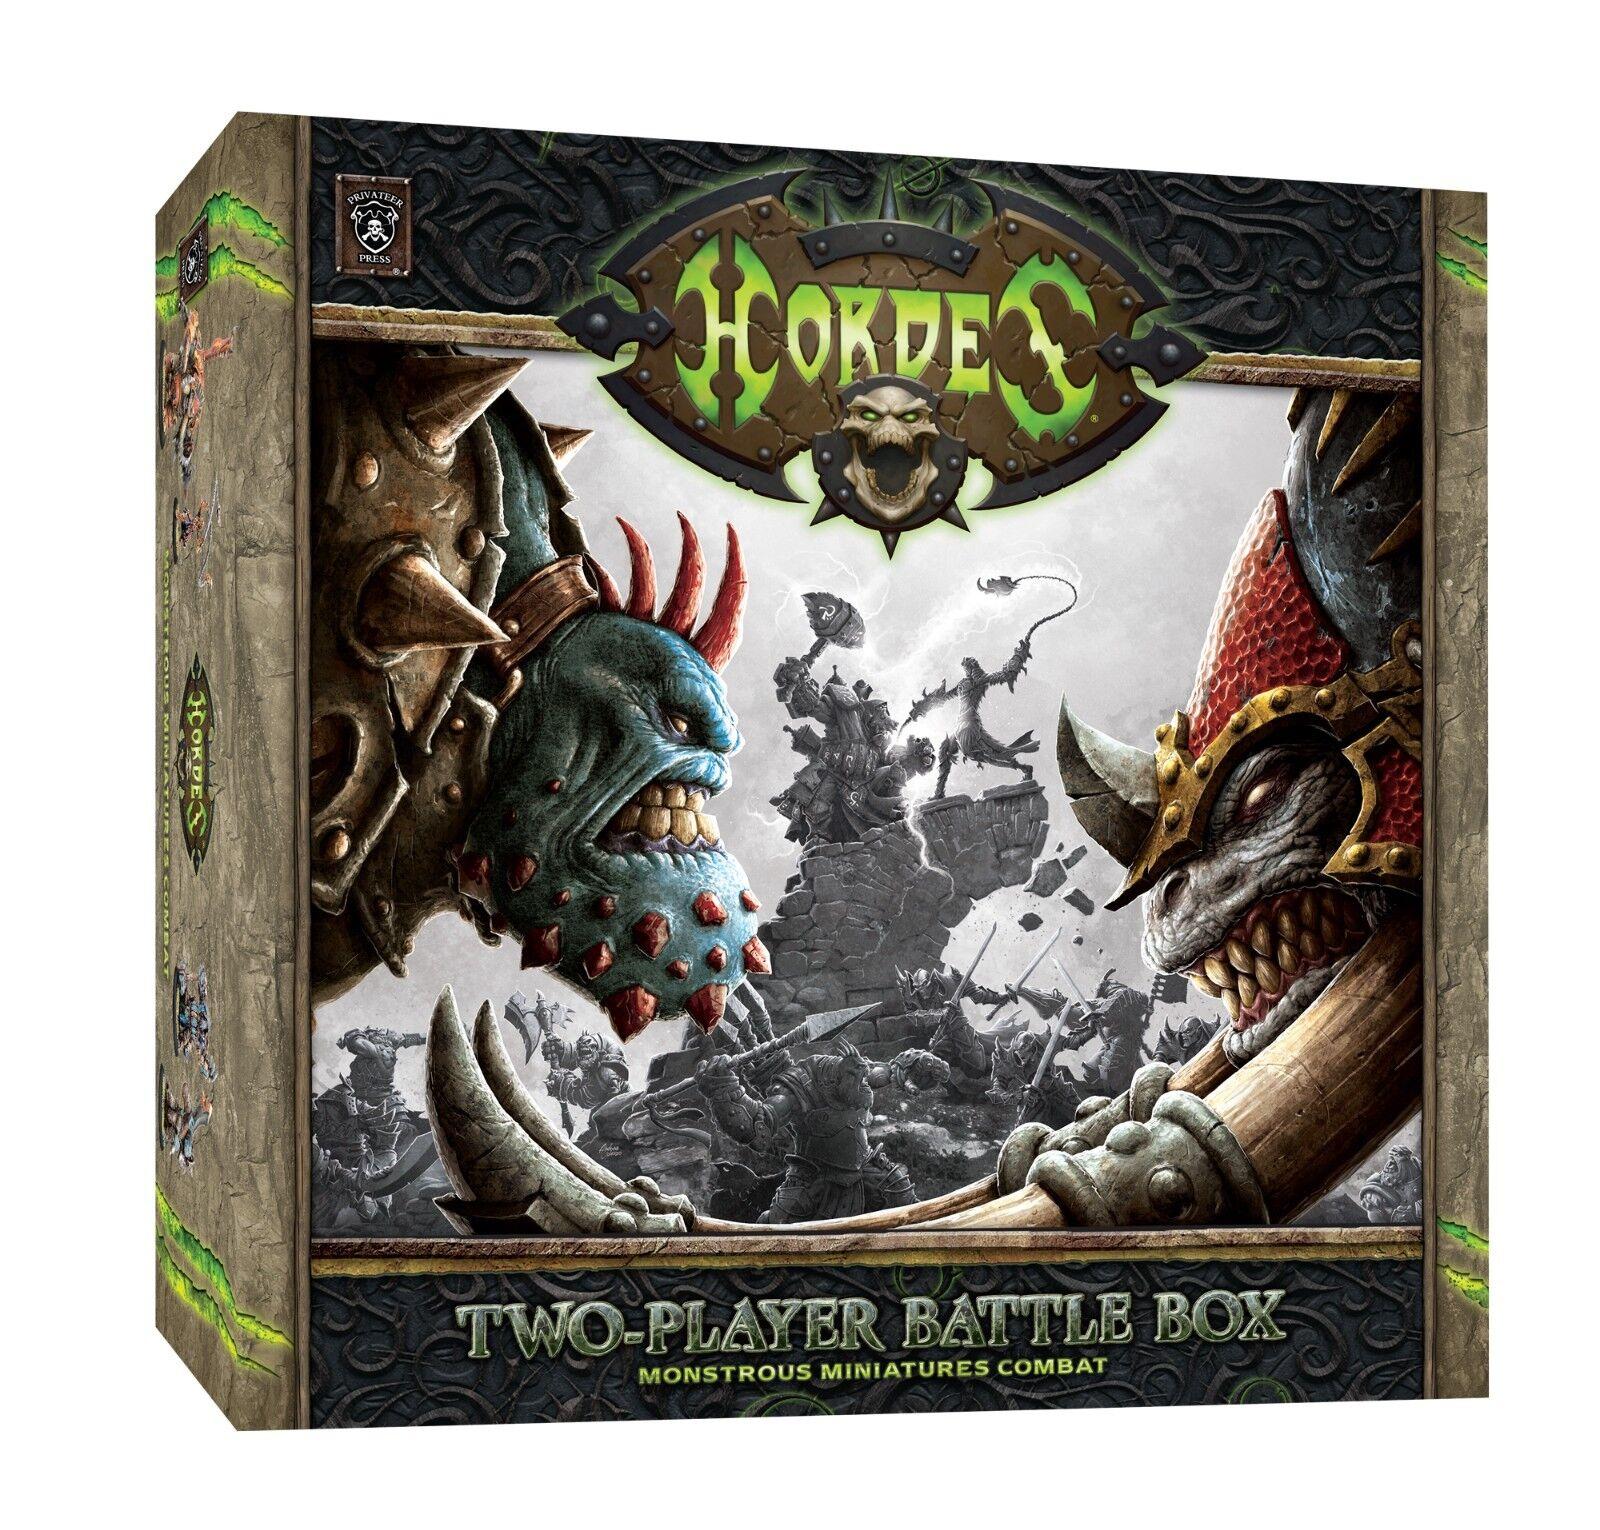 Freibeuter presse horden zwei spieler battlebox pip 70002 nib